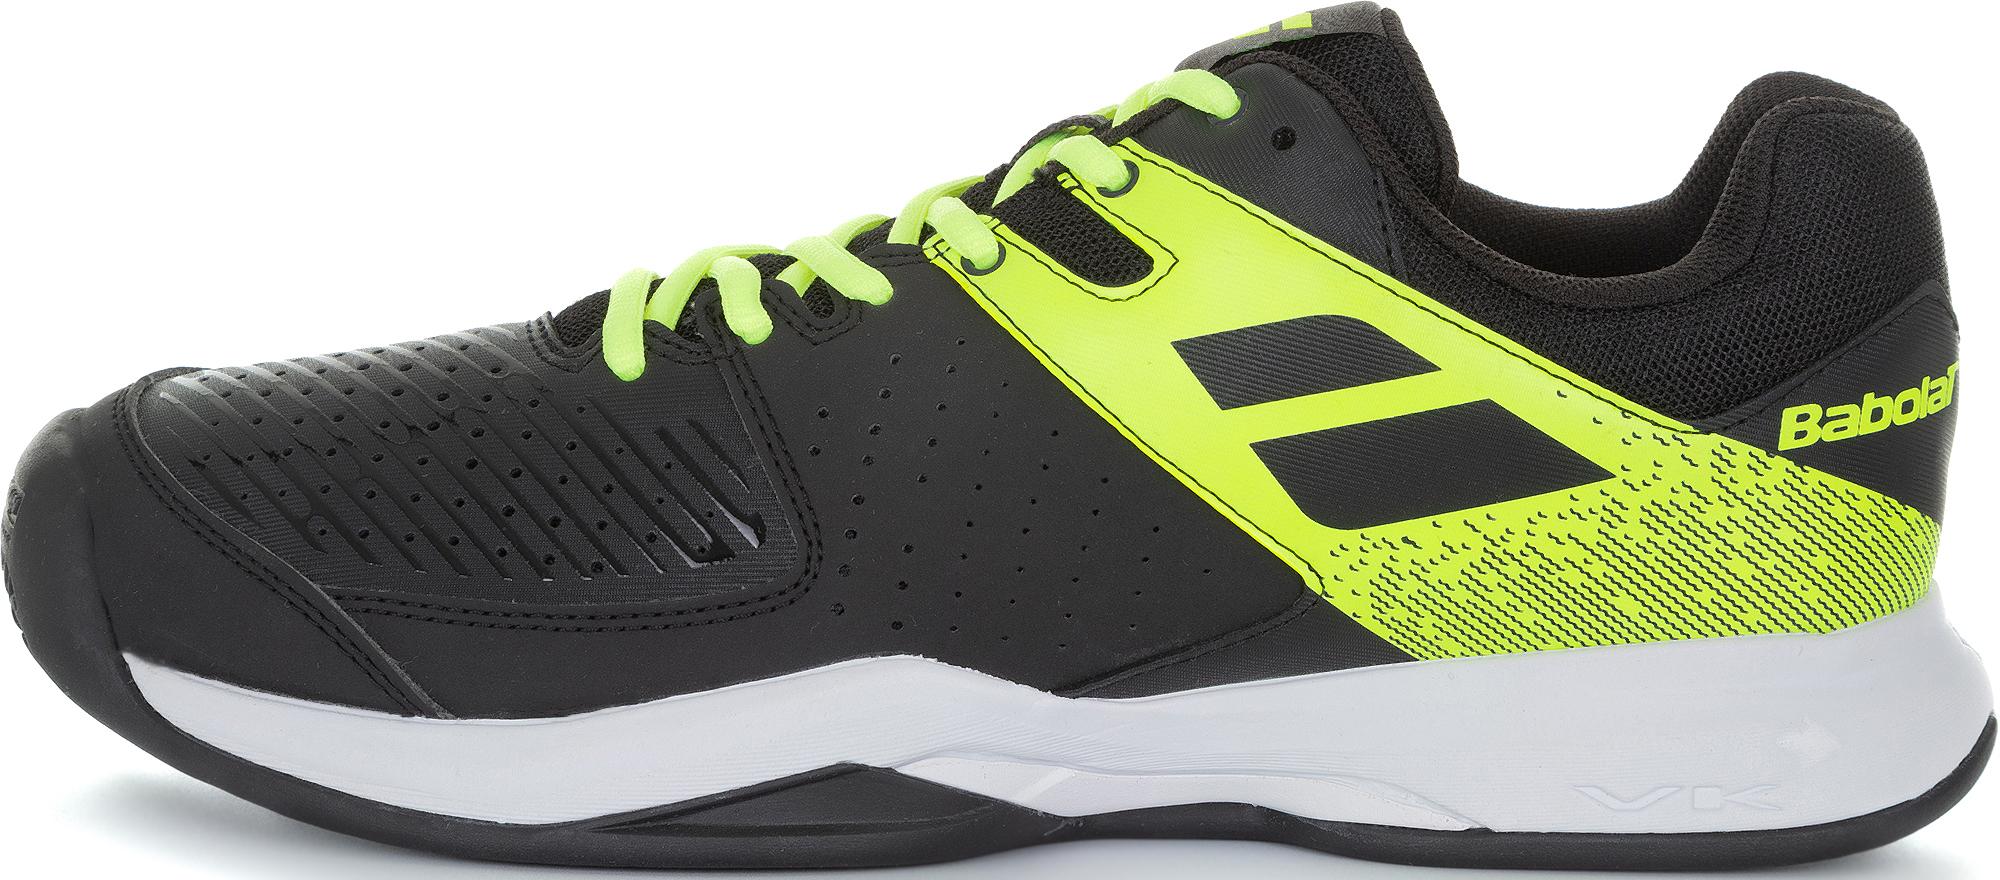 Babolat Кроссовки мужские Babolat Pulsion Clay, размер 46 babolat кроссовки для мальчиков babolat pulsion all court